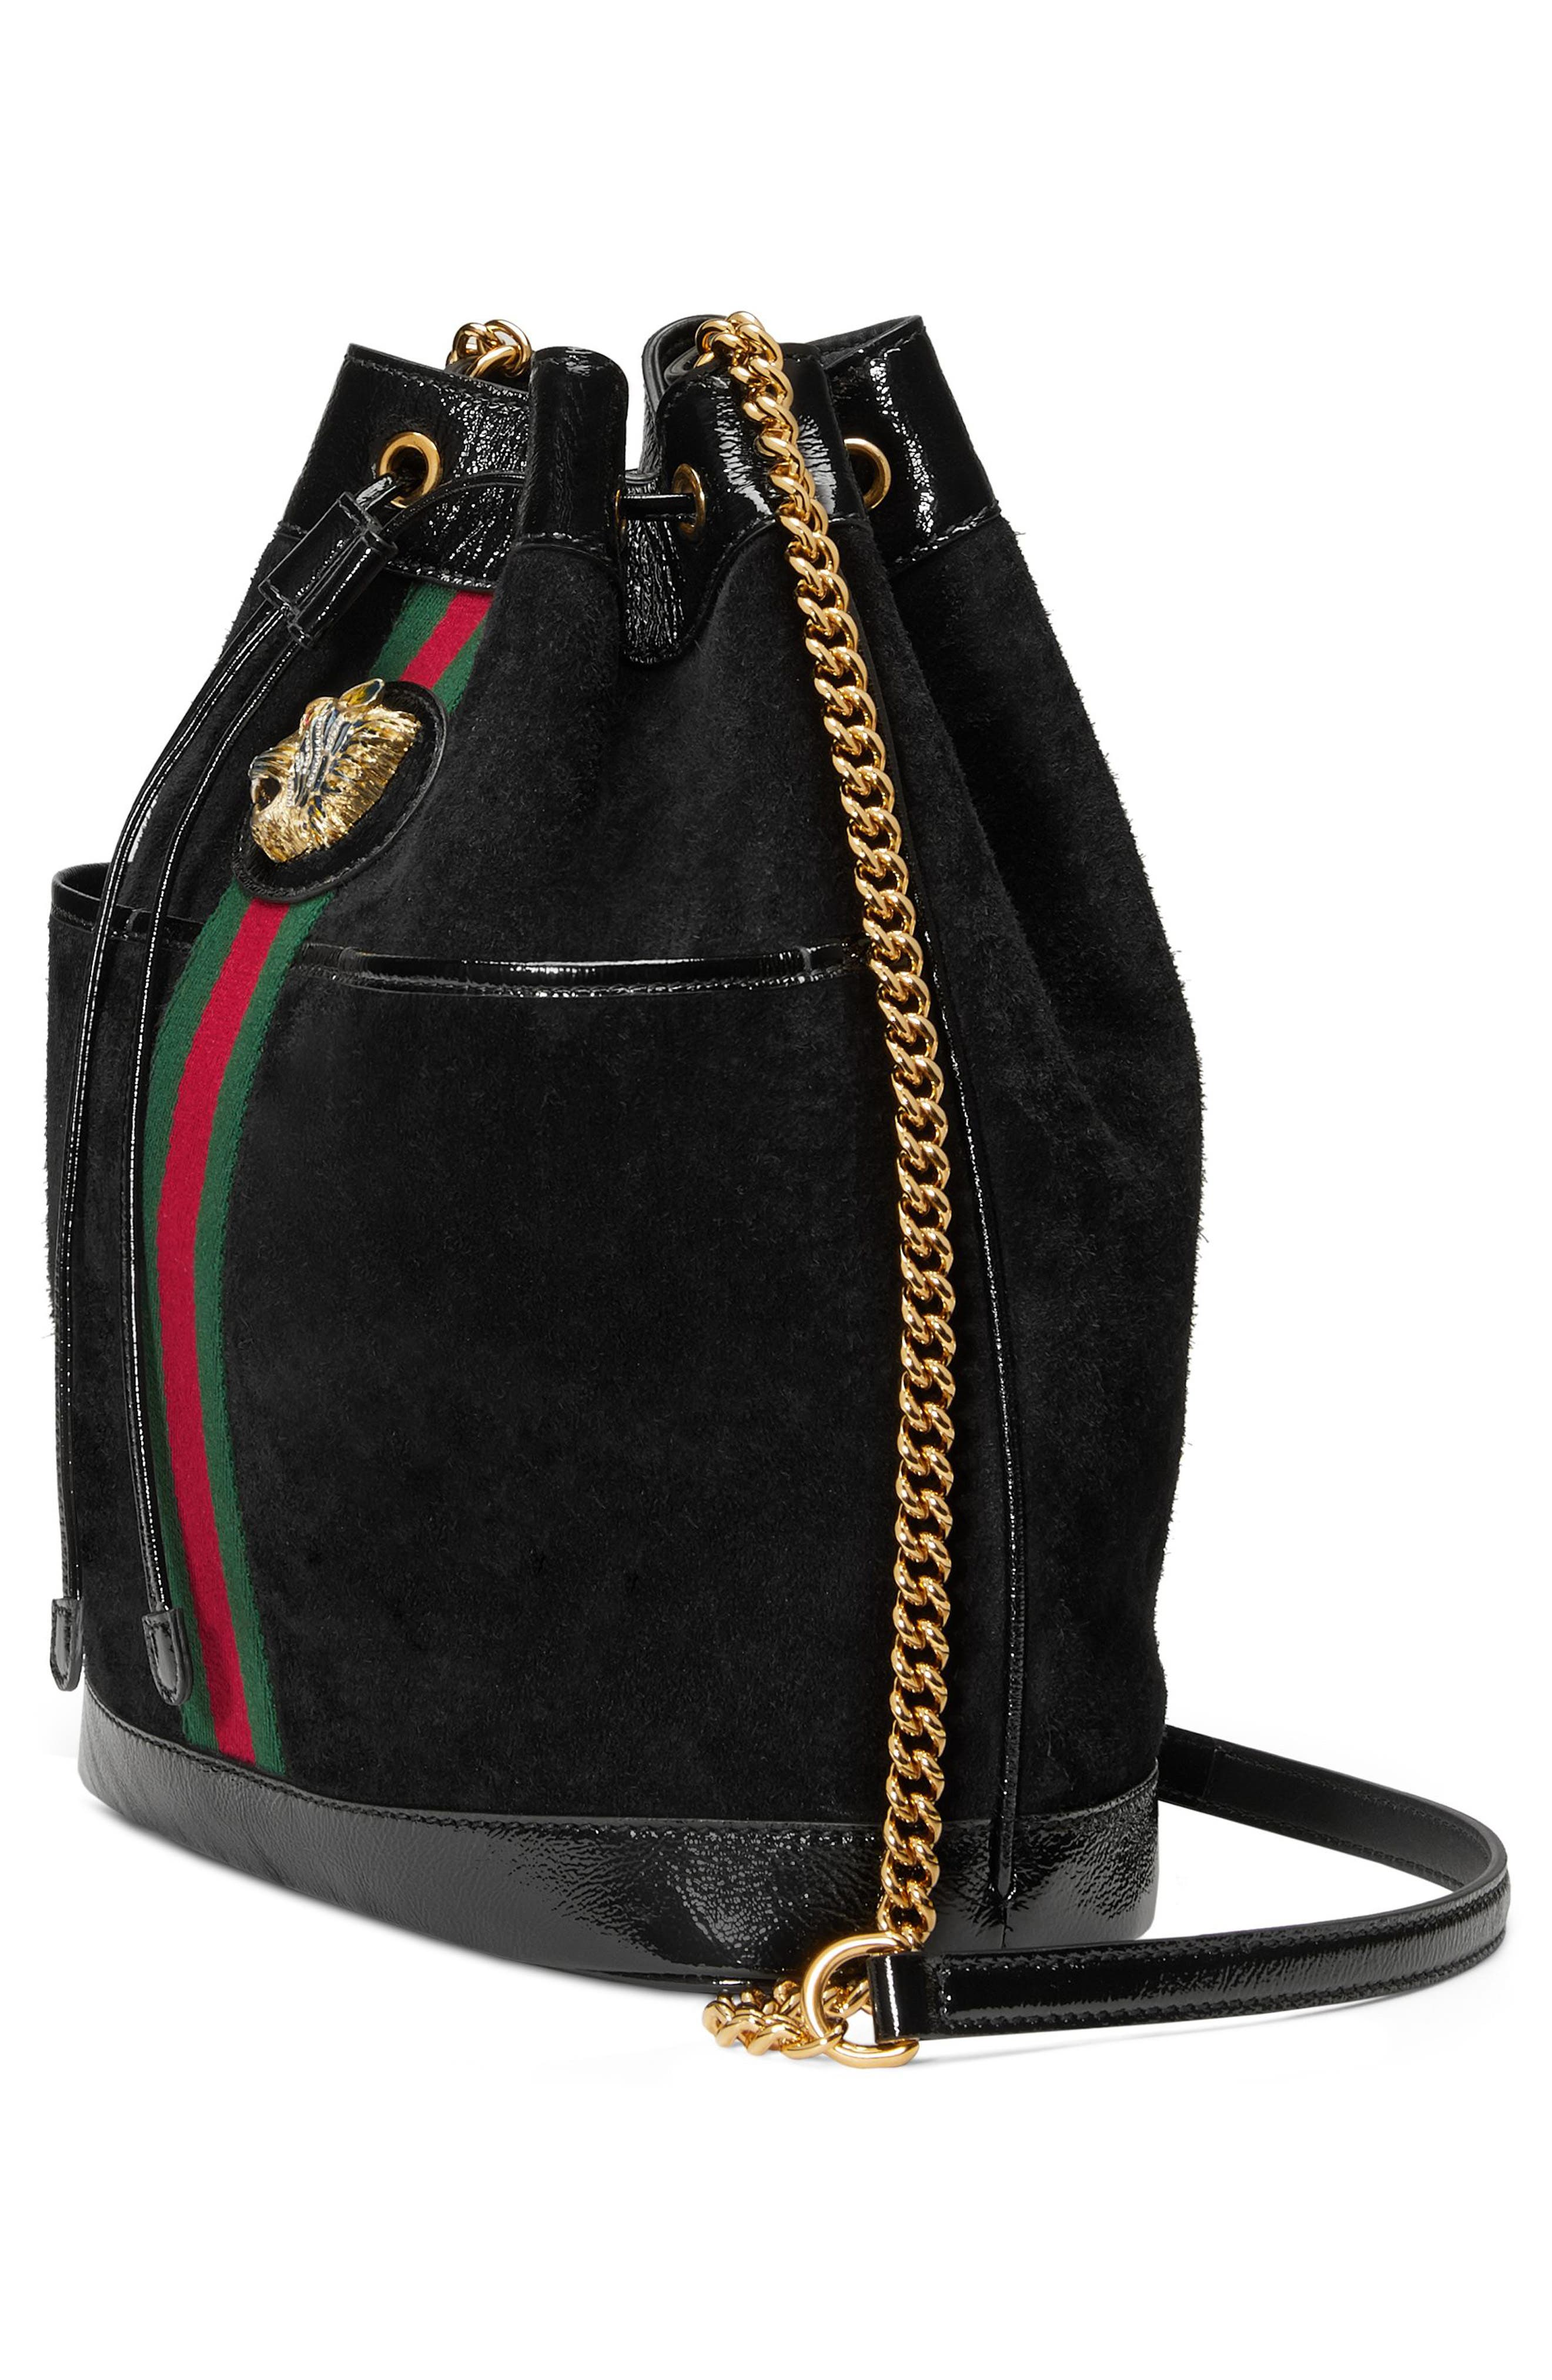 Linea Rajah Suede Bucket Bag,                             Alternate thumbnail 4, color,                             NERO/ VERT/ RED MULTI